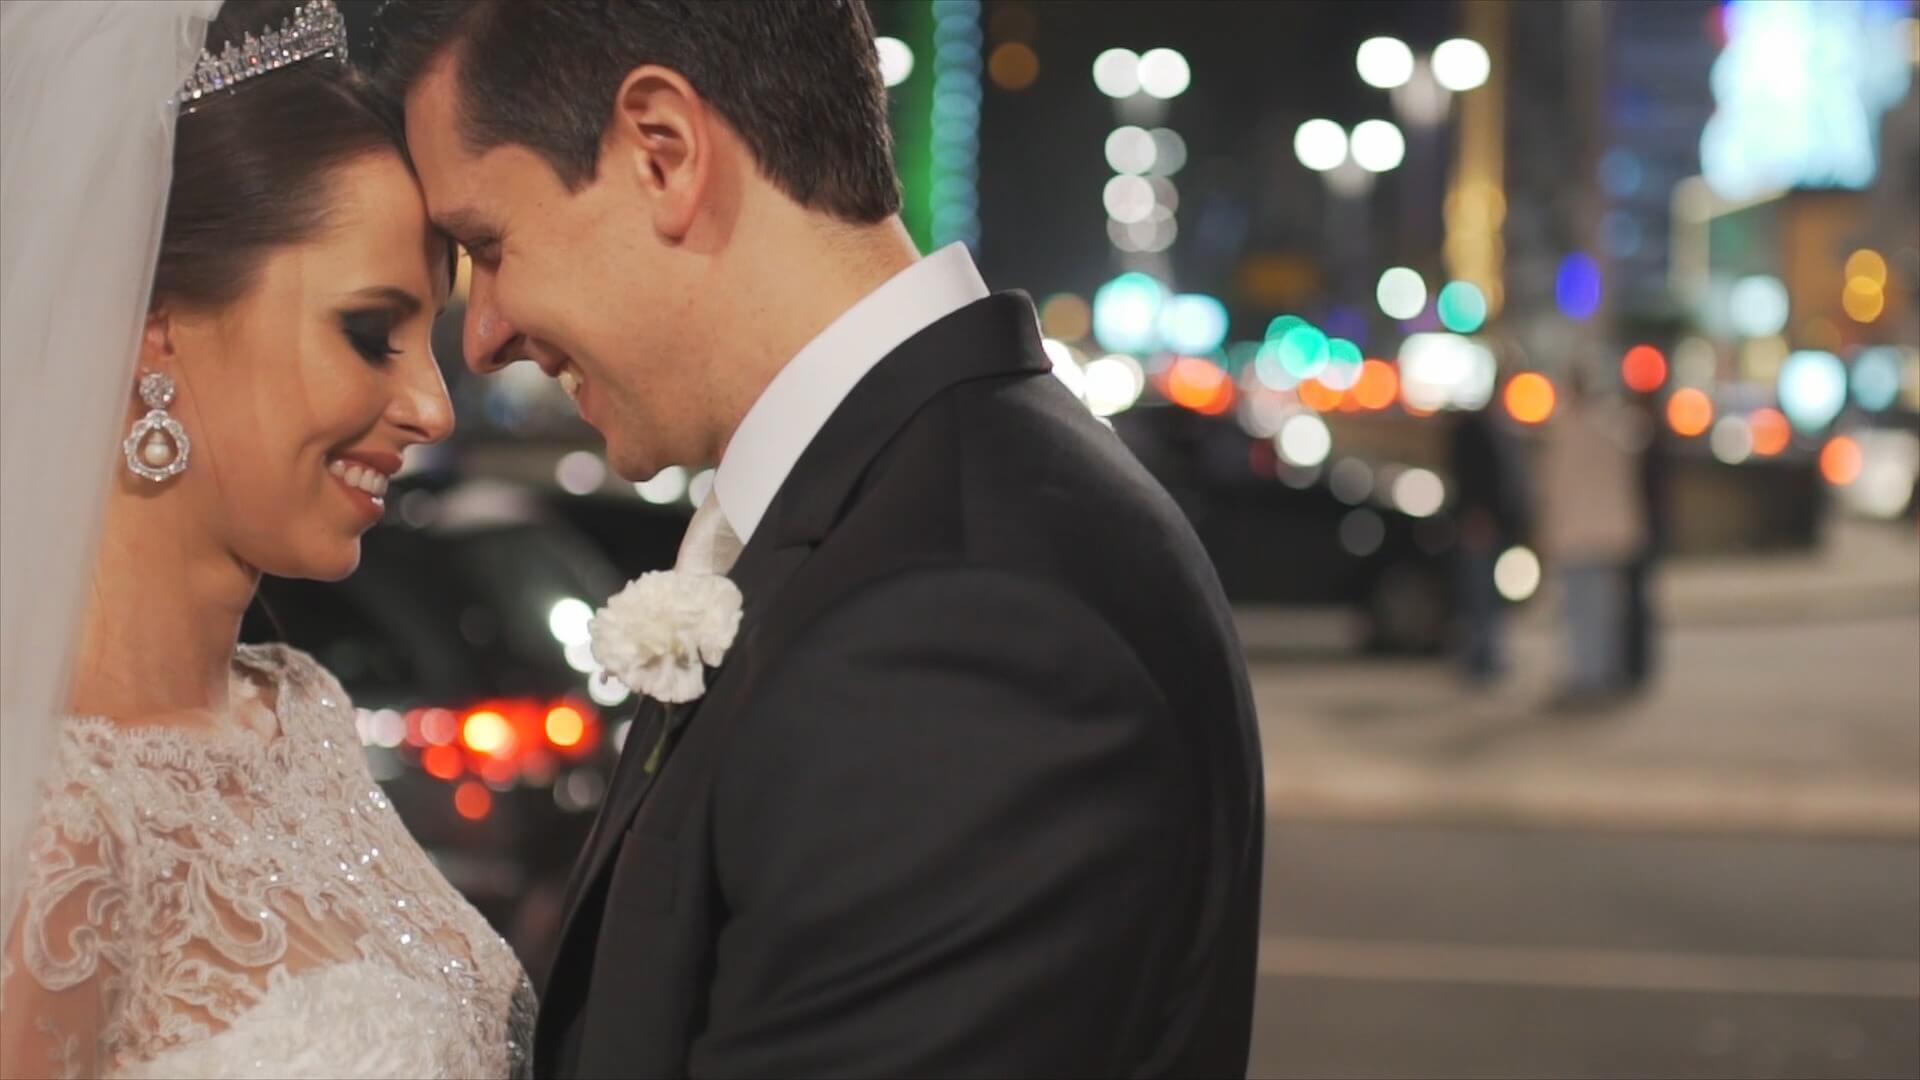 casamento_igreja_sao_luis_fasano (14)